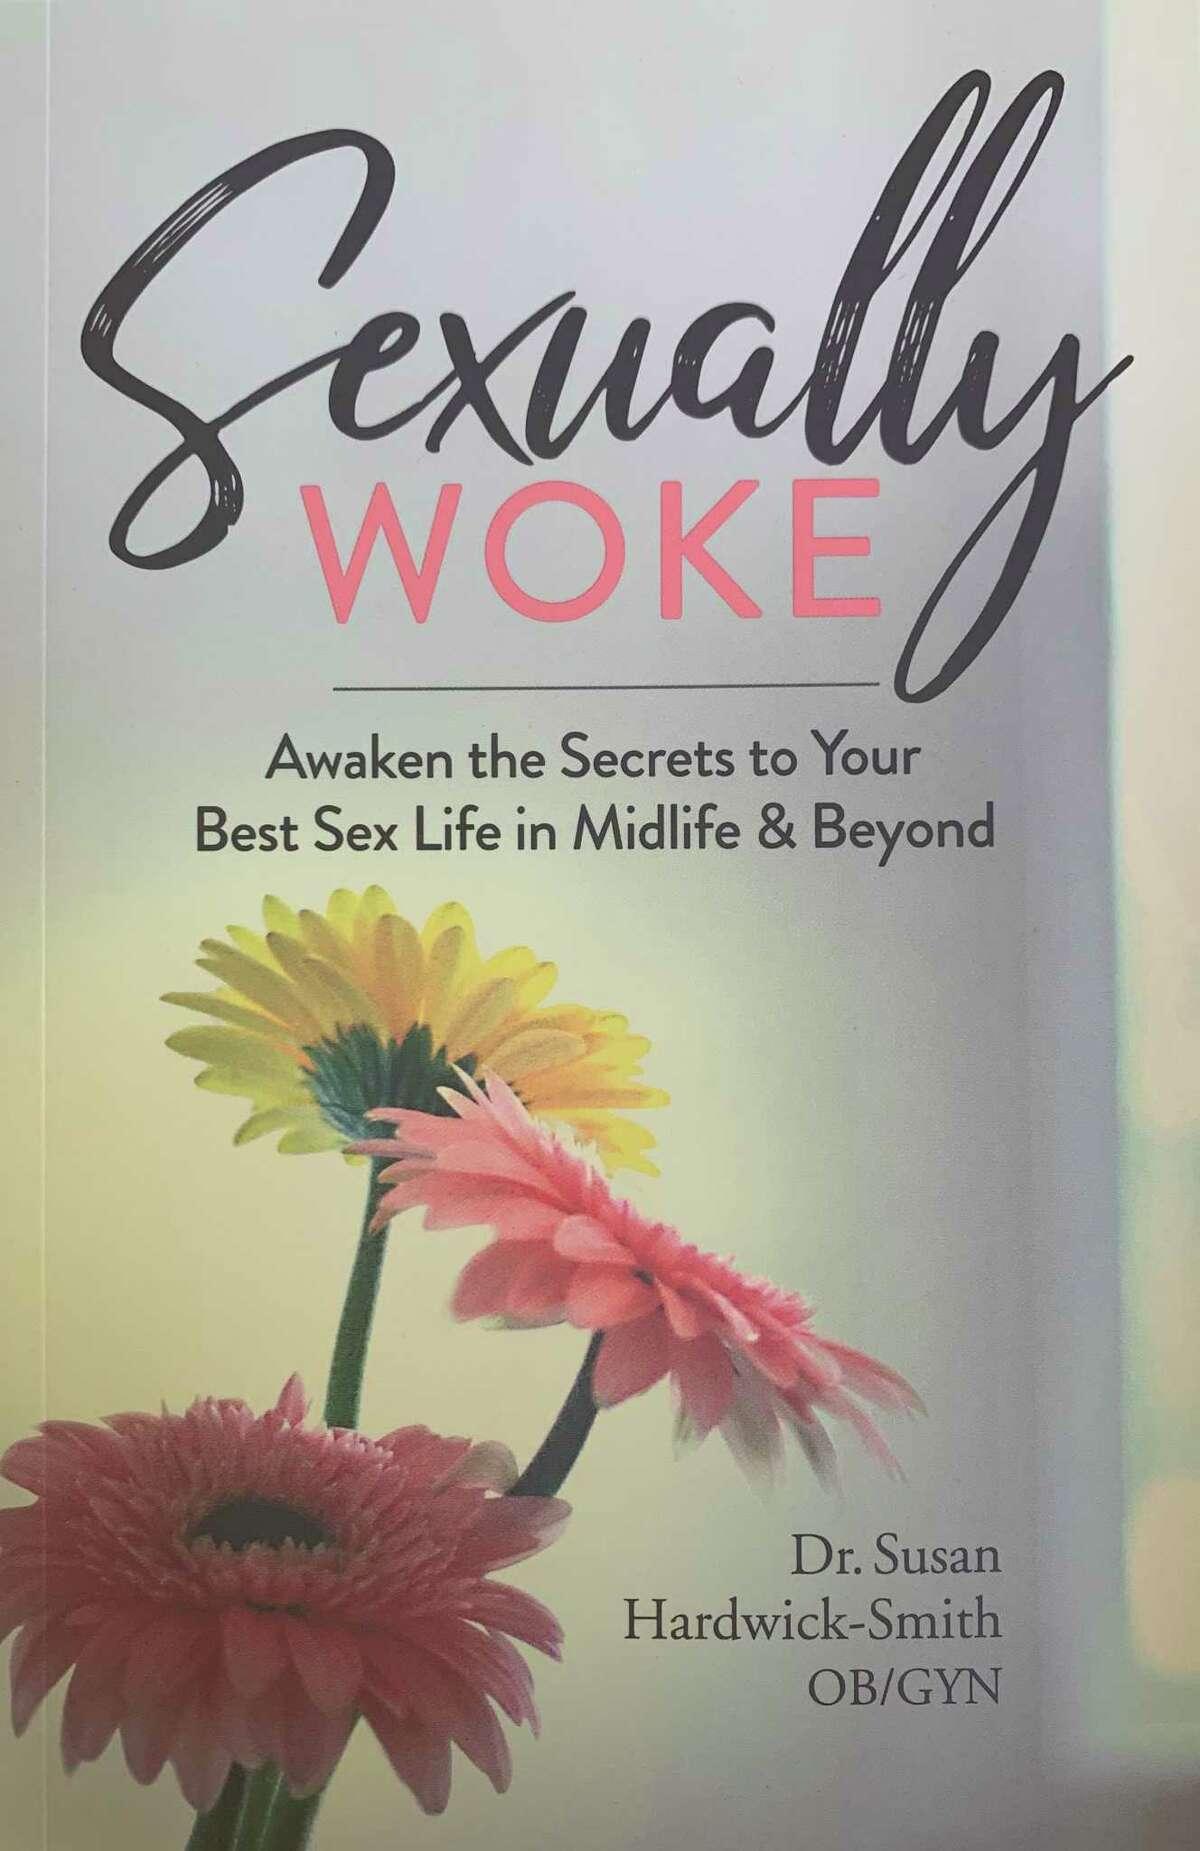 Sexually Woke, by Dr. Susan Hardwick-Smith